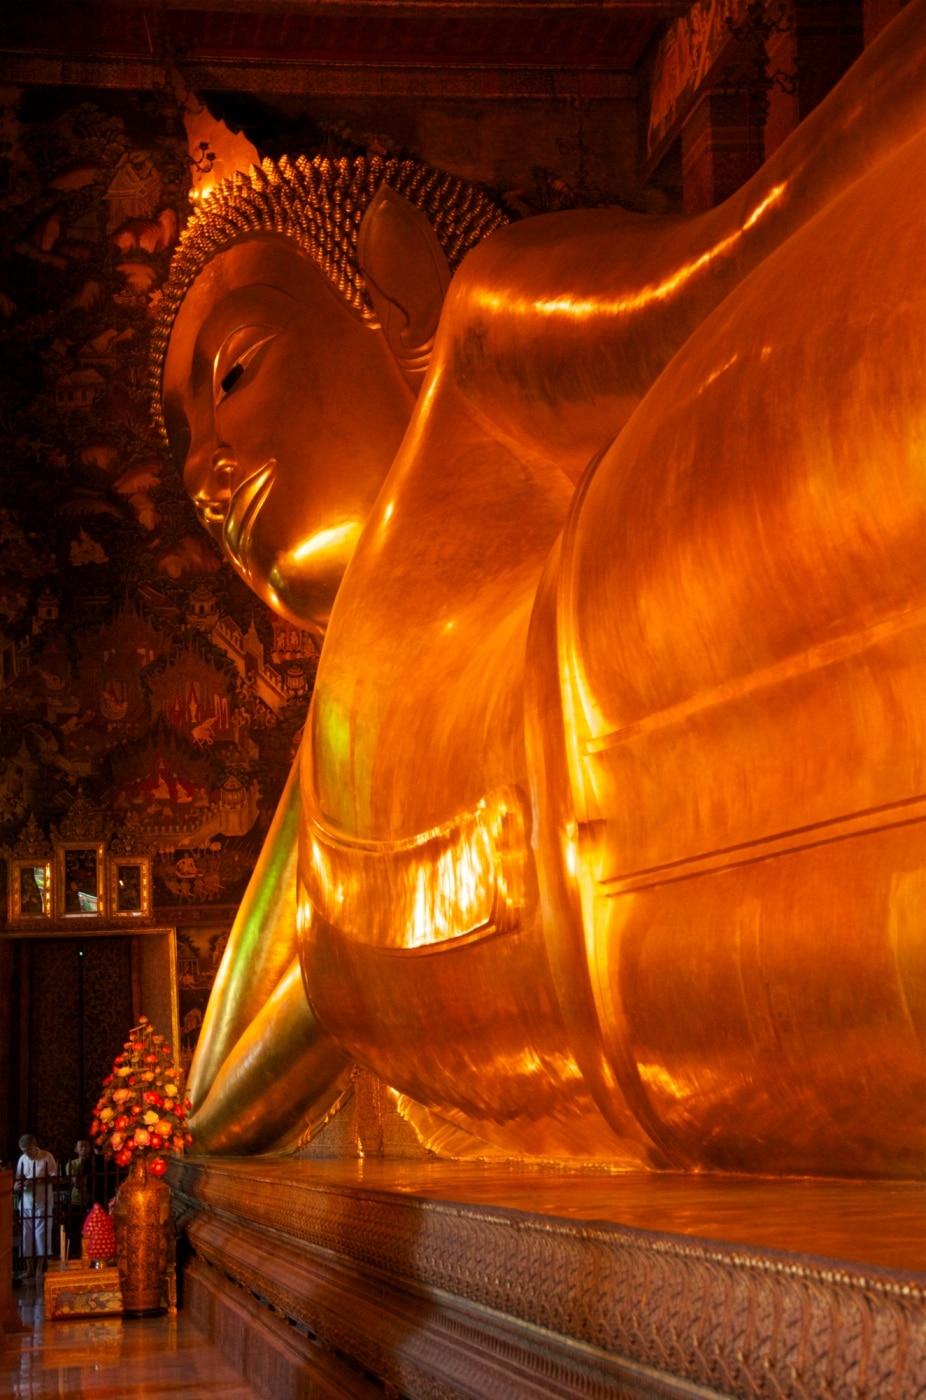 & Reclining Buddha Wat Pho Bangkok - Travel Past 50 islam-shia.org